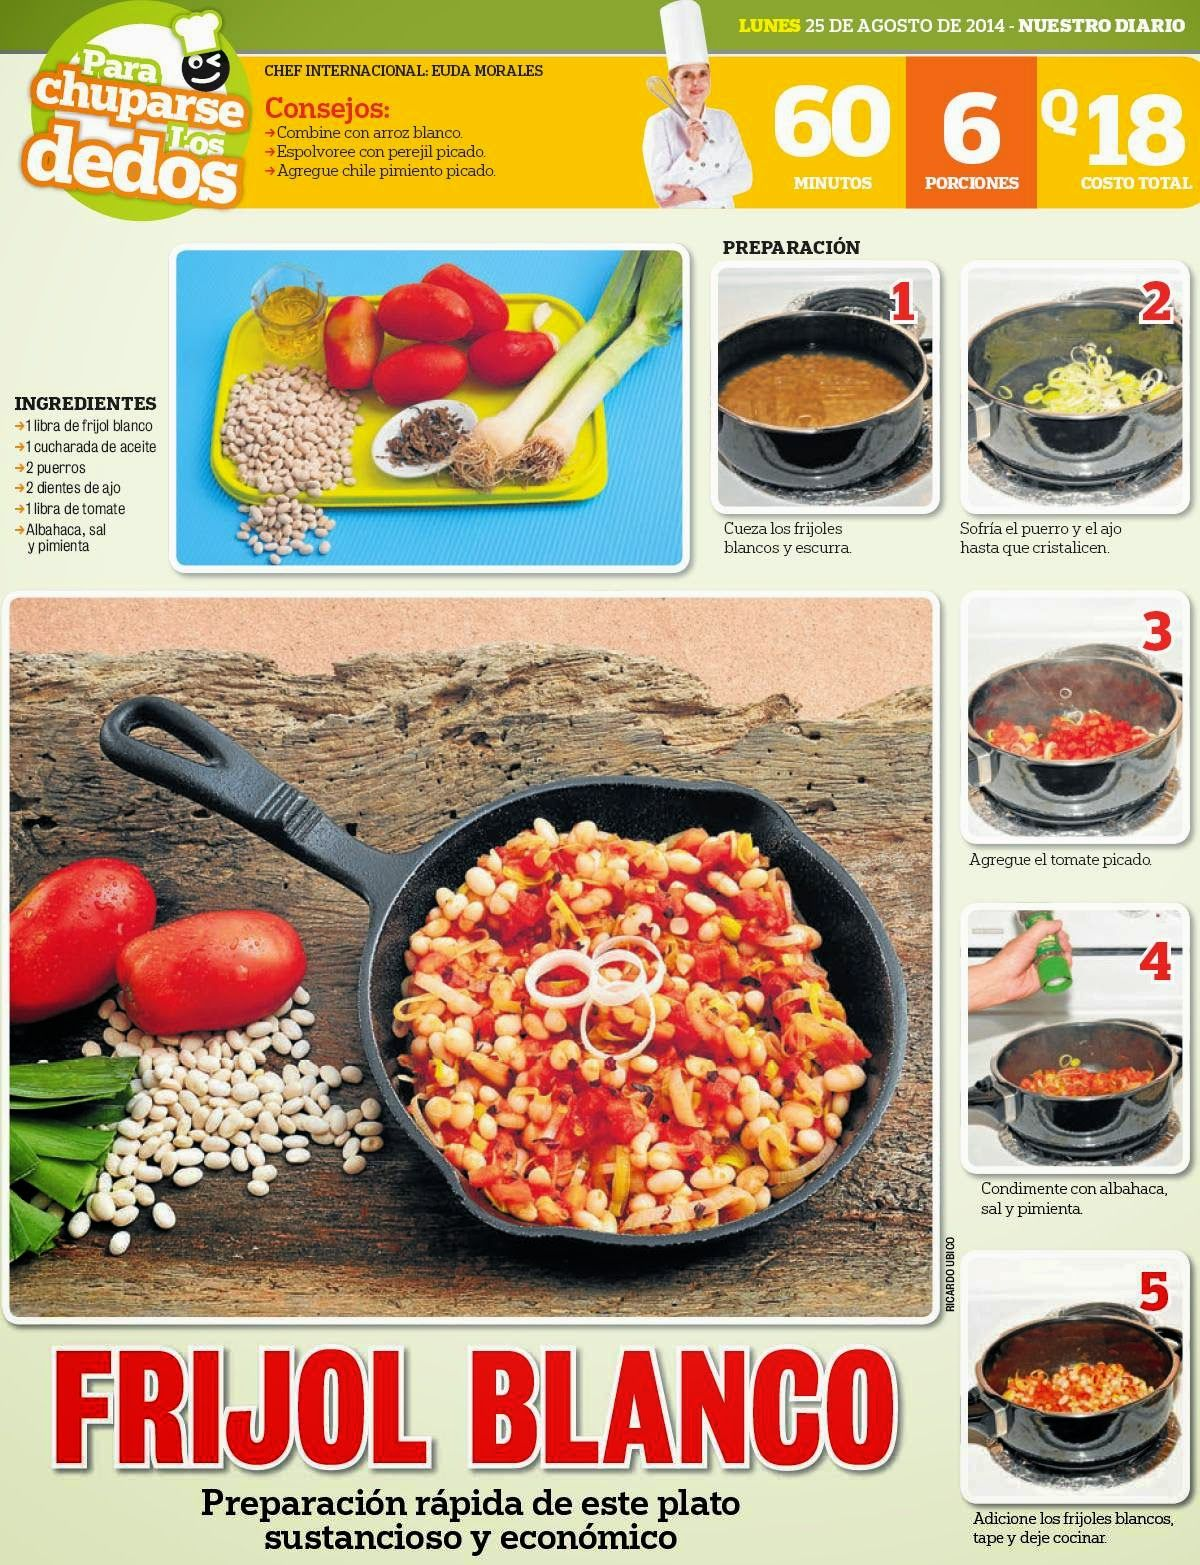 e4f0cec4ddef71087f2b9ab5a2230e70 - Cocinar Recetas